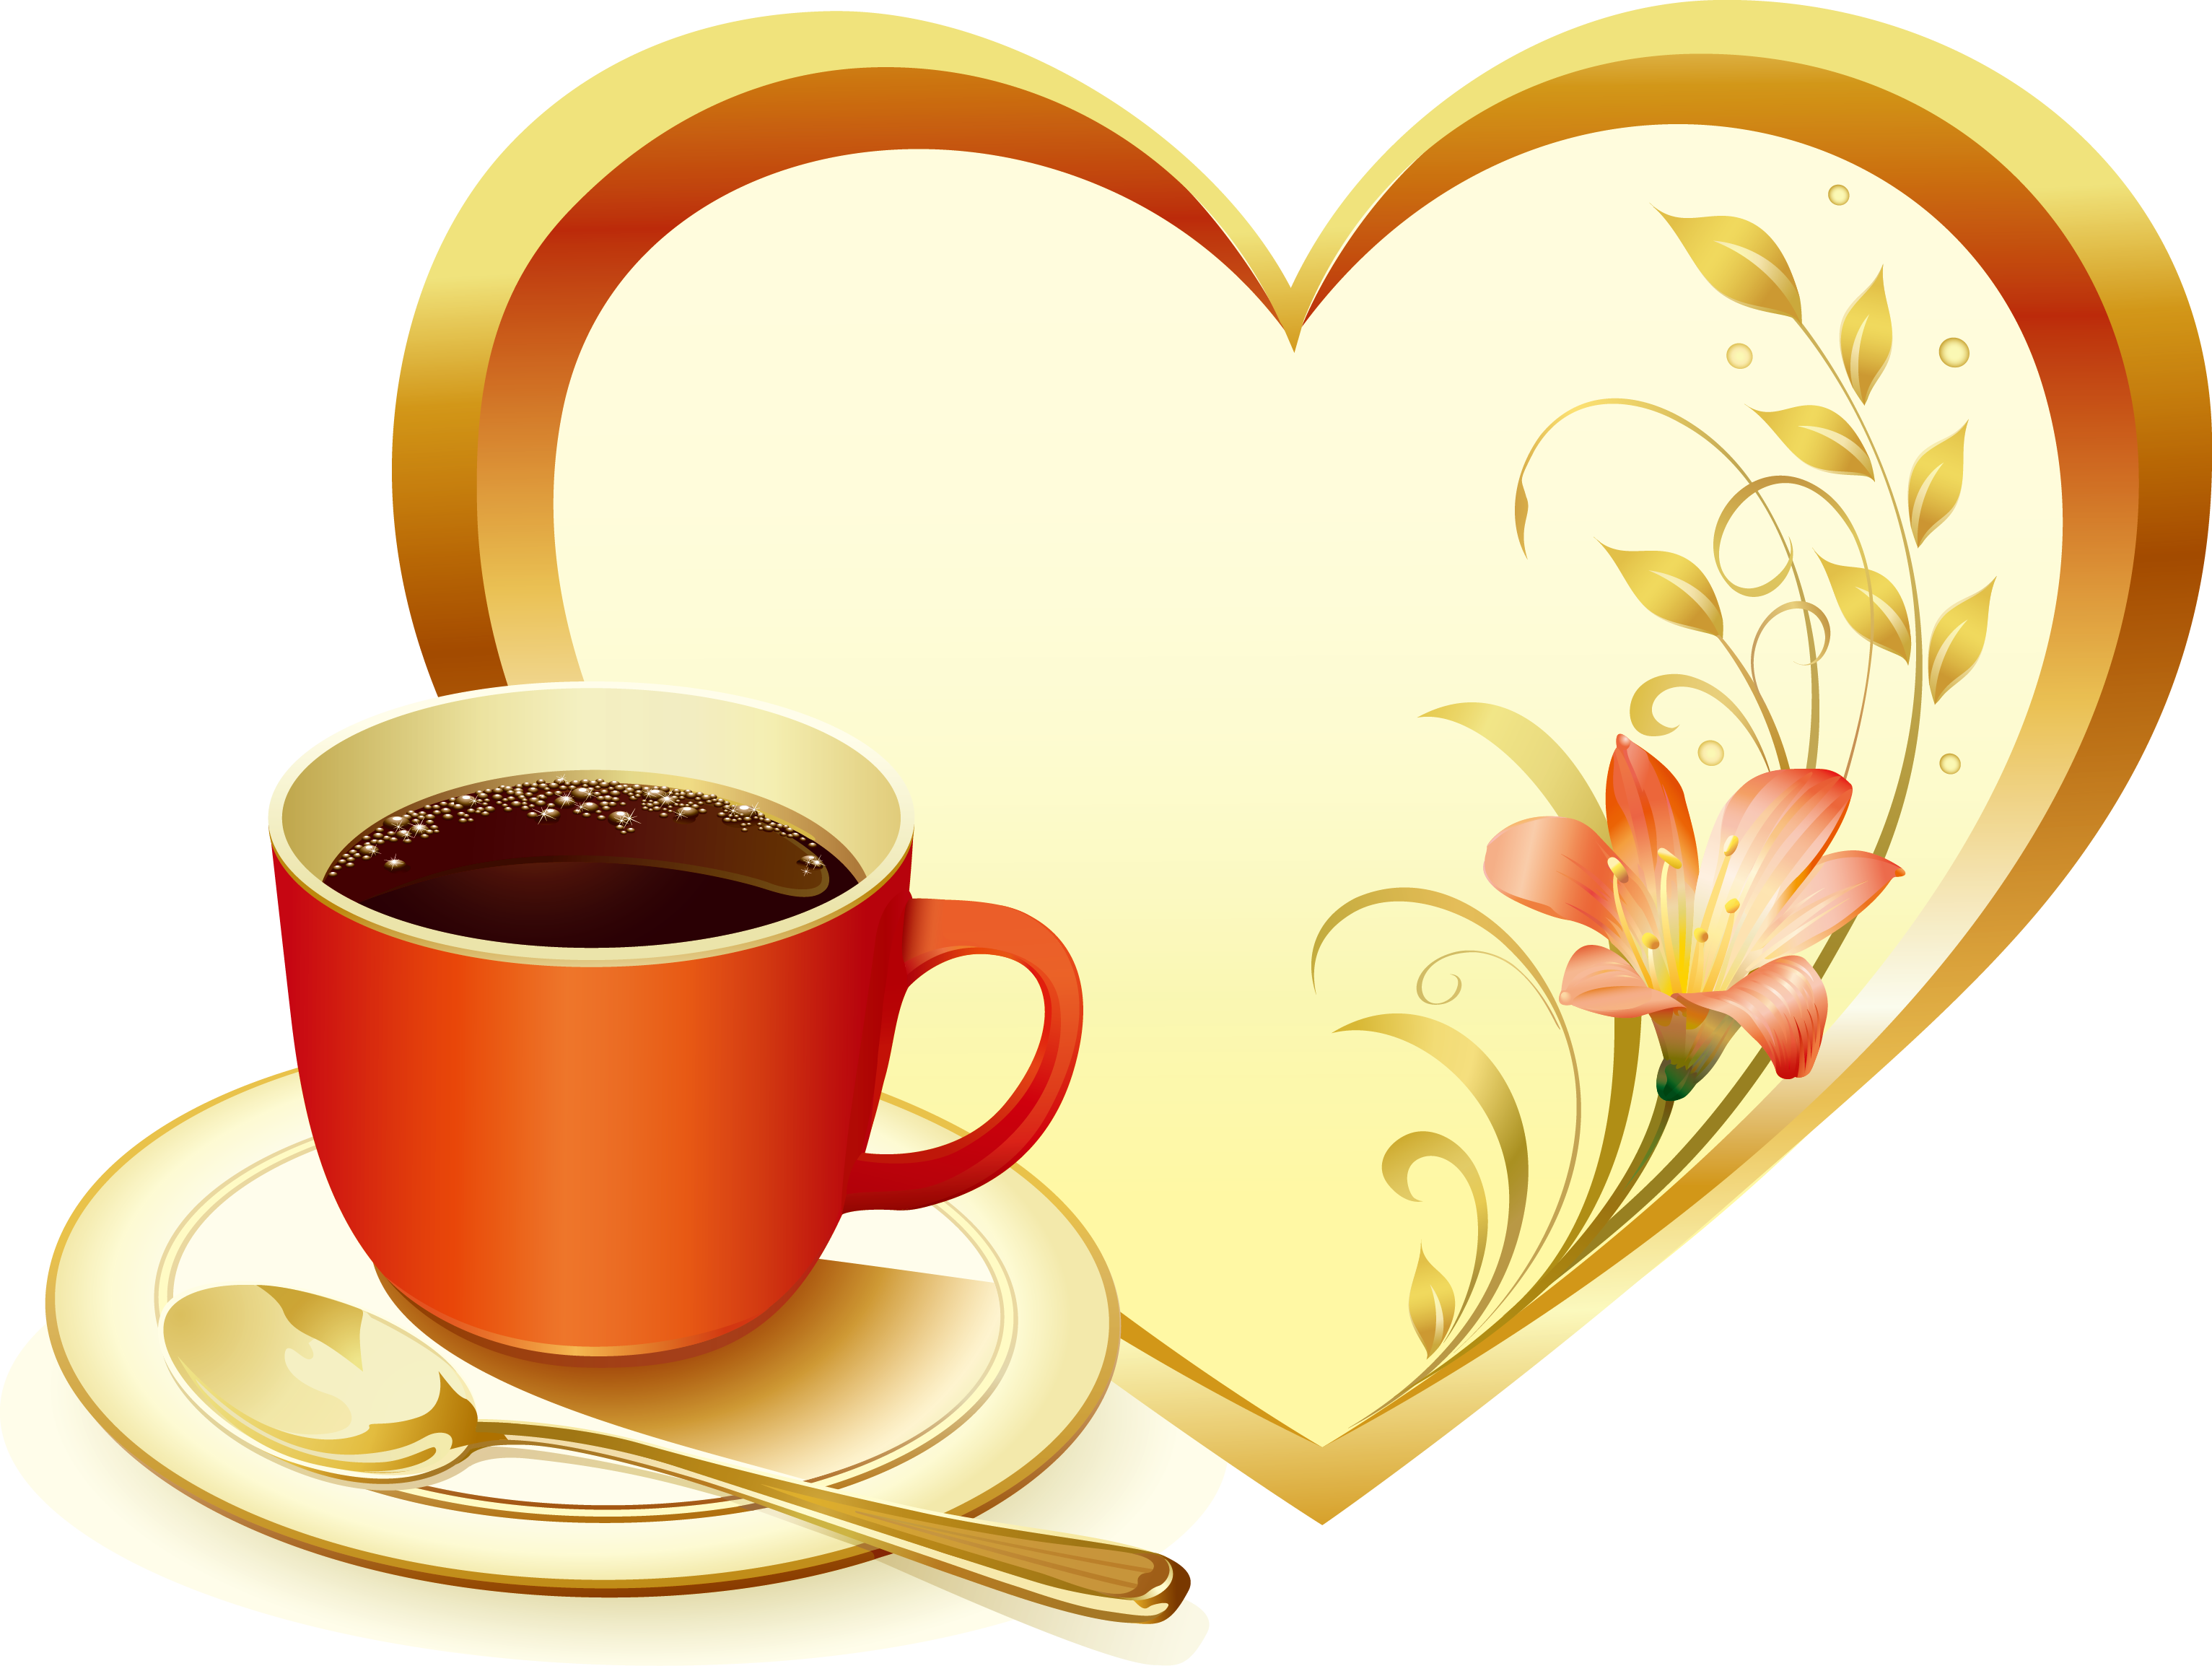 Coffee cup heart clipart clip art library Coffee Cafe Caffè Americano Latte Menu - Heart-shaped frame 3065 ... clip art library